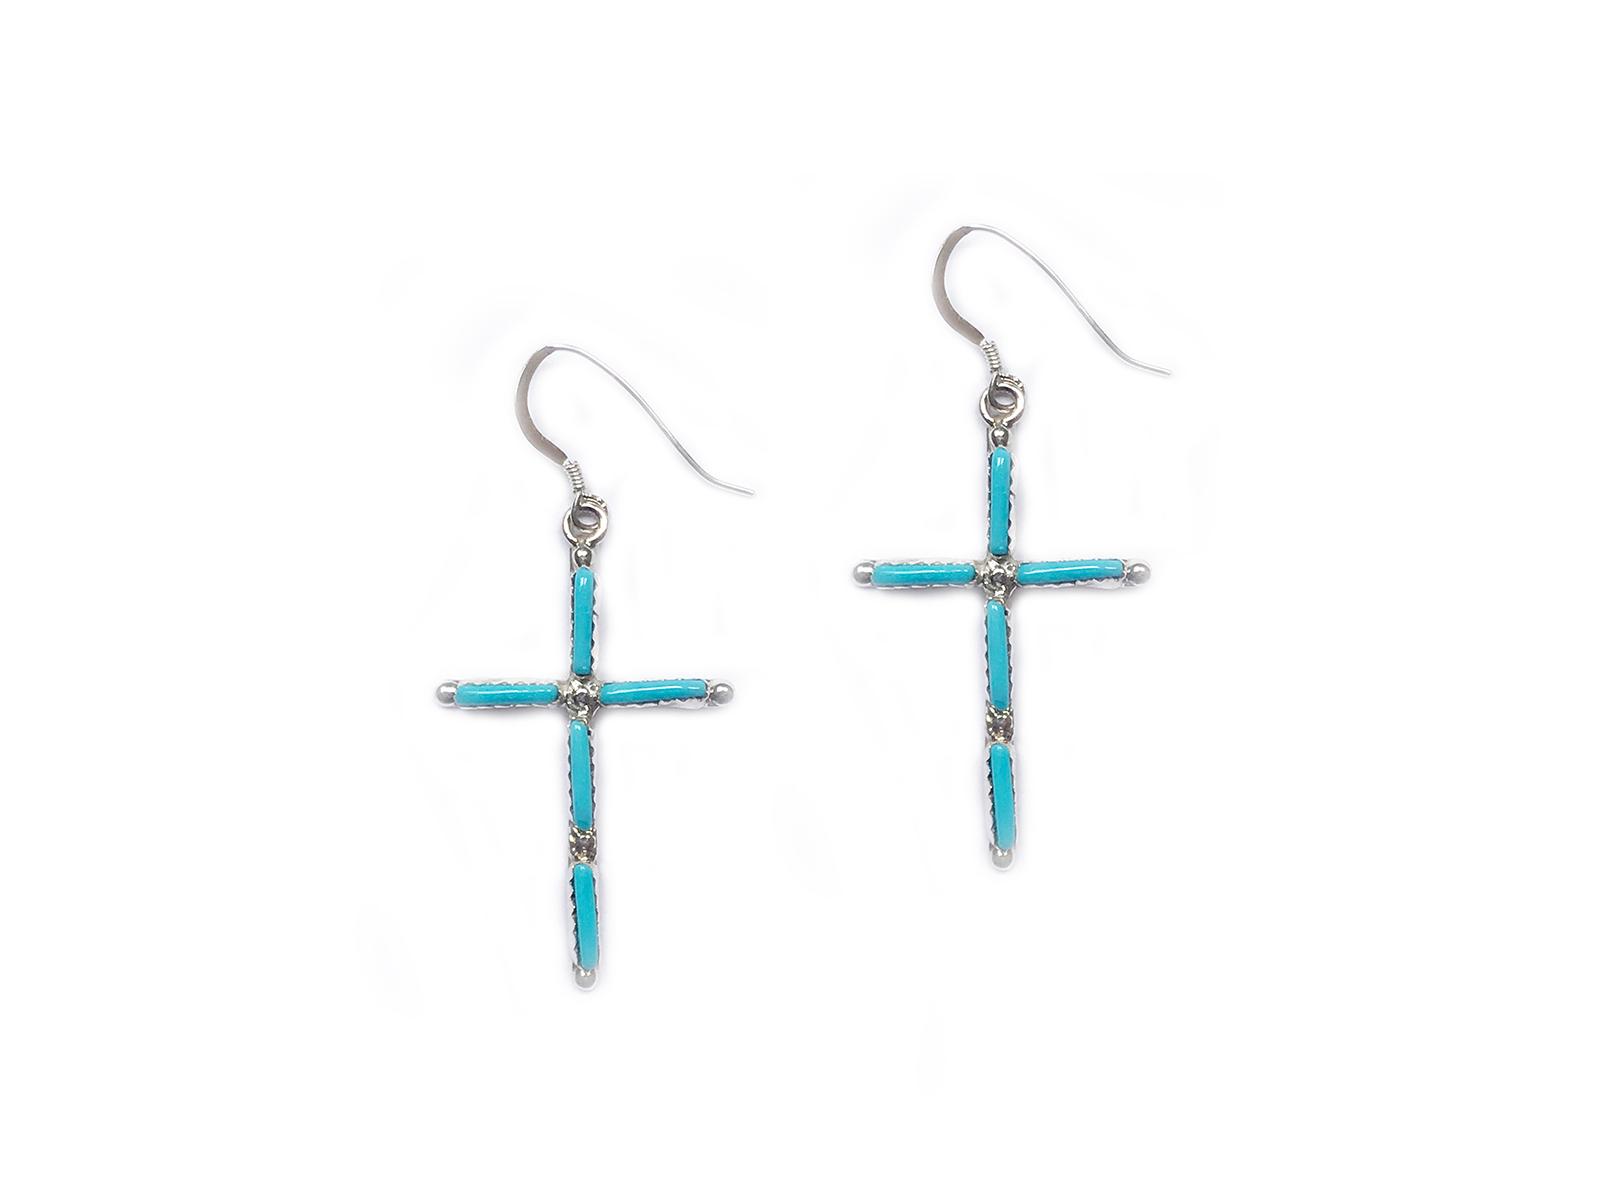 90a579623 Sleeping Beauty Turquoise Cross Earrings handmade by Katherine Qualo